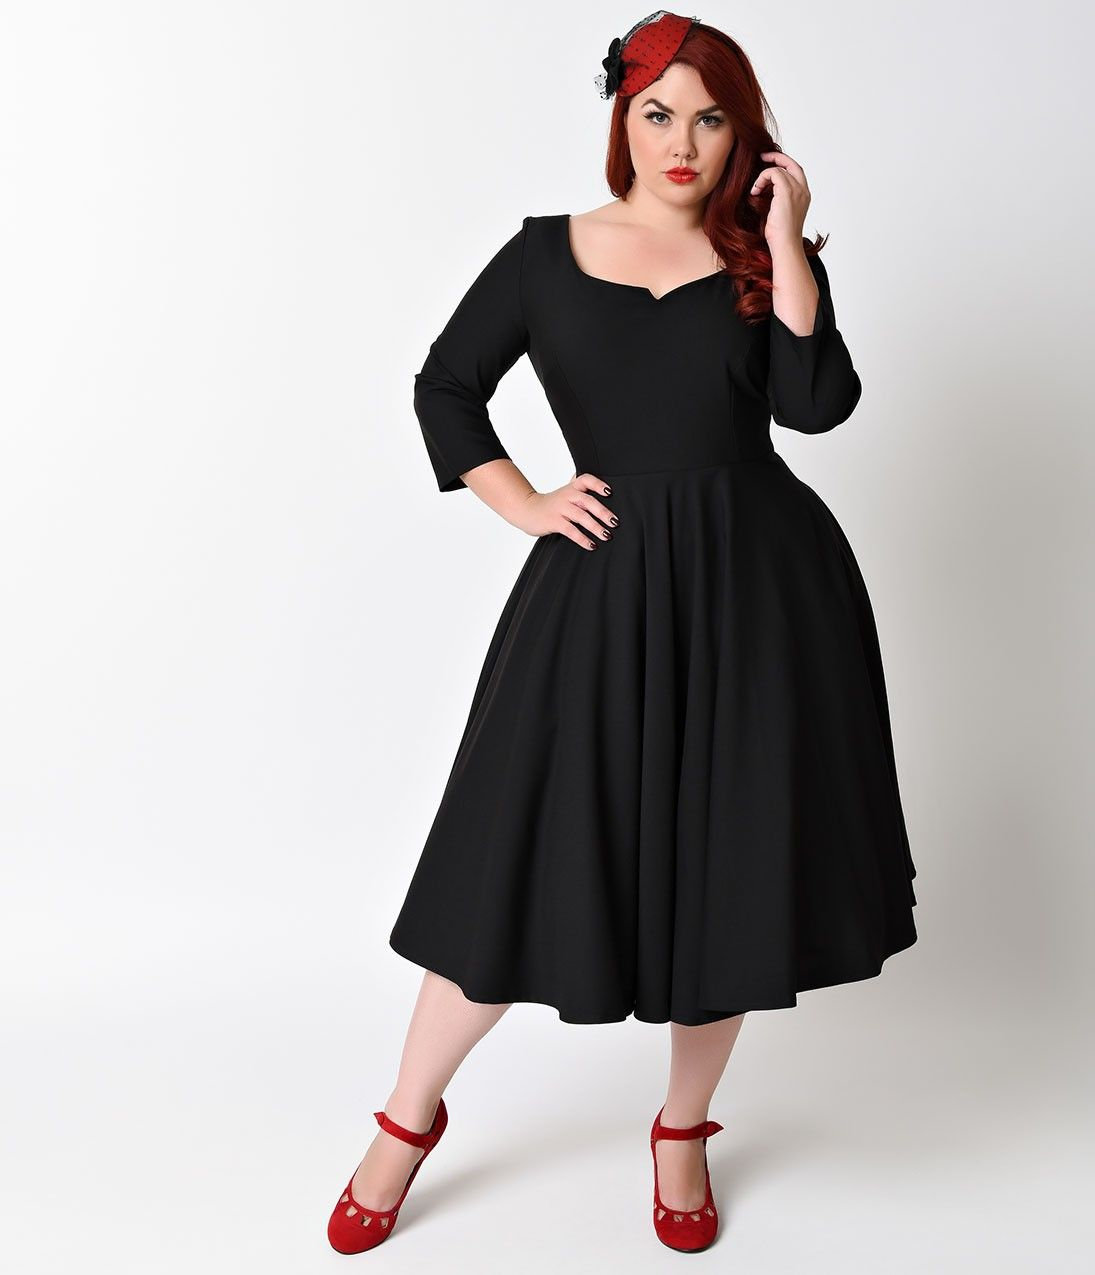 vintage kleider große größe | vintage kleider, kleider, kleidung